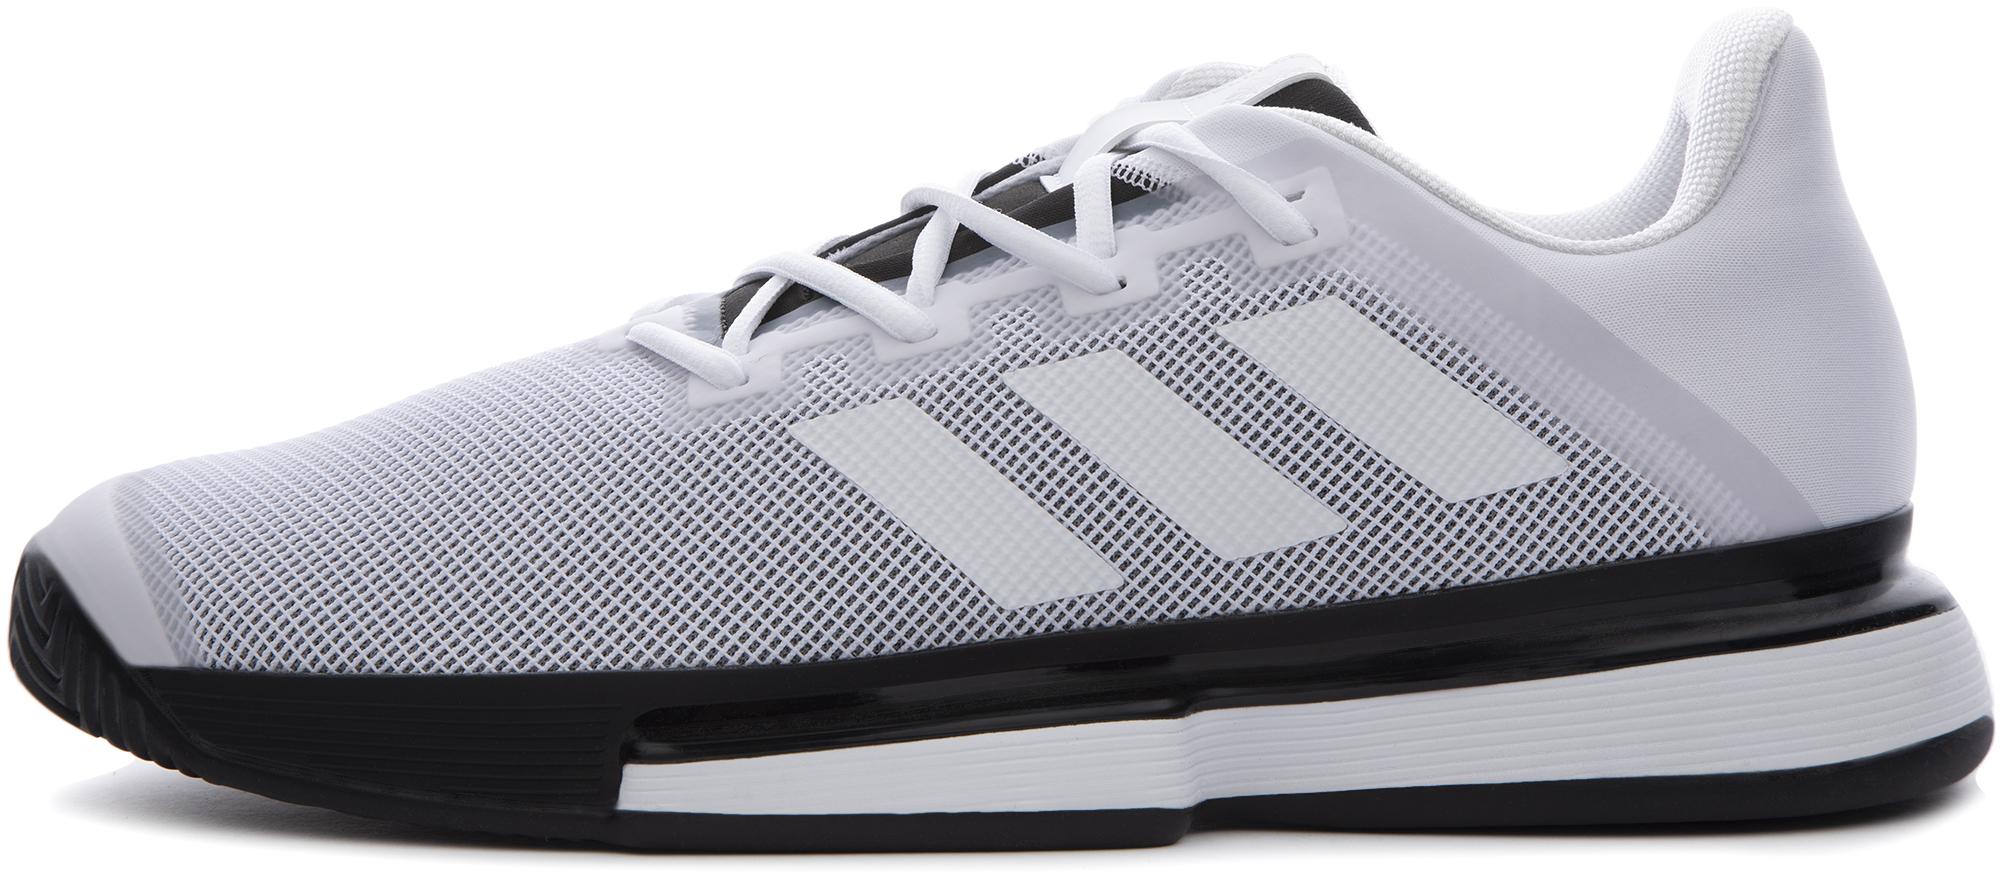 Adidas Кроссовки мужские для тенниса Adidas Bounce, размер 46 цена